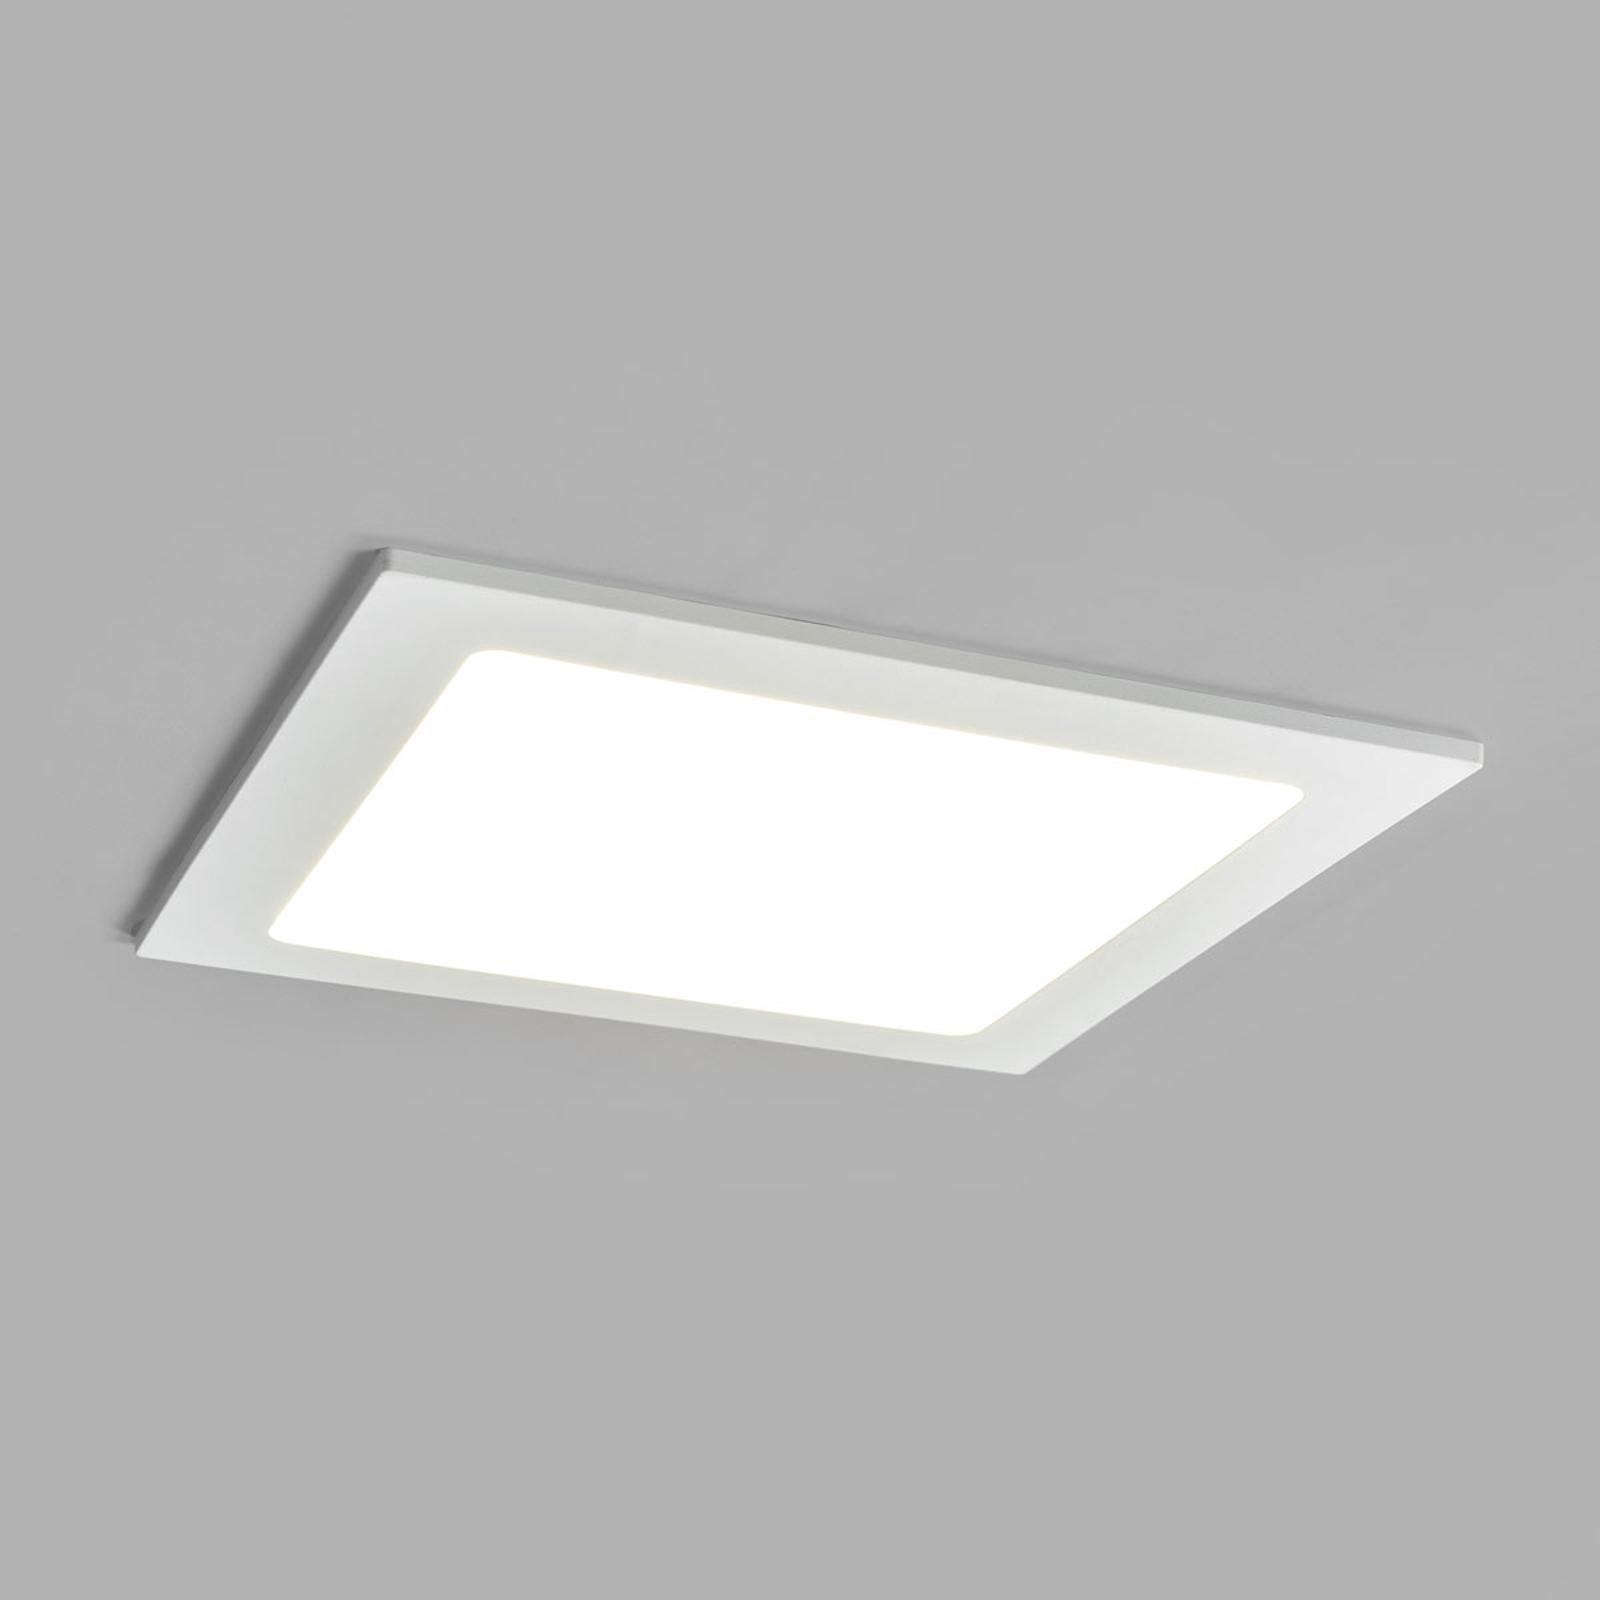 Downlight LED Joki bianco 4000K angolare 22cm